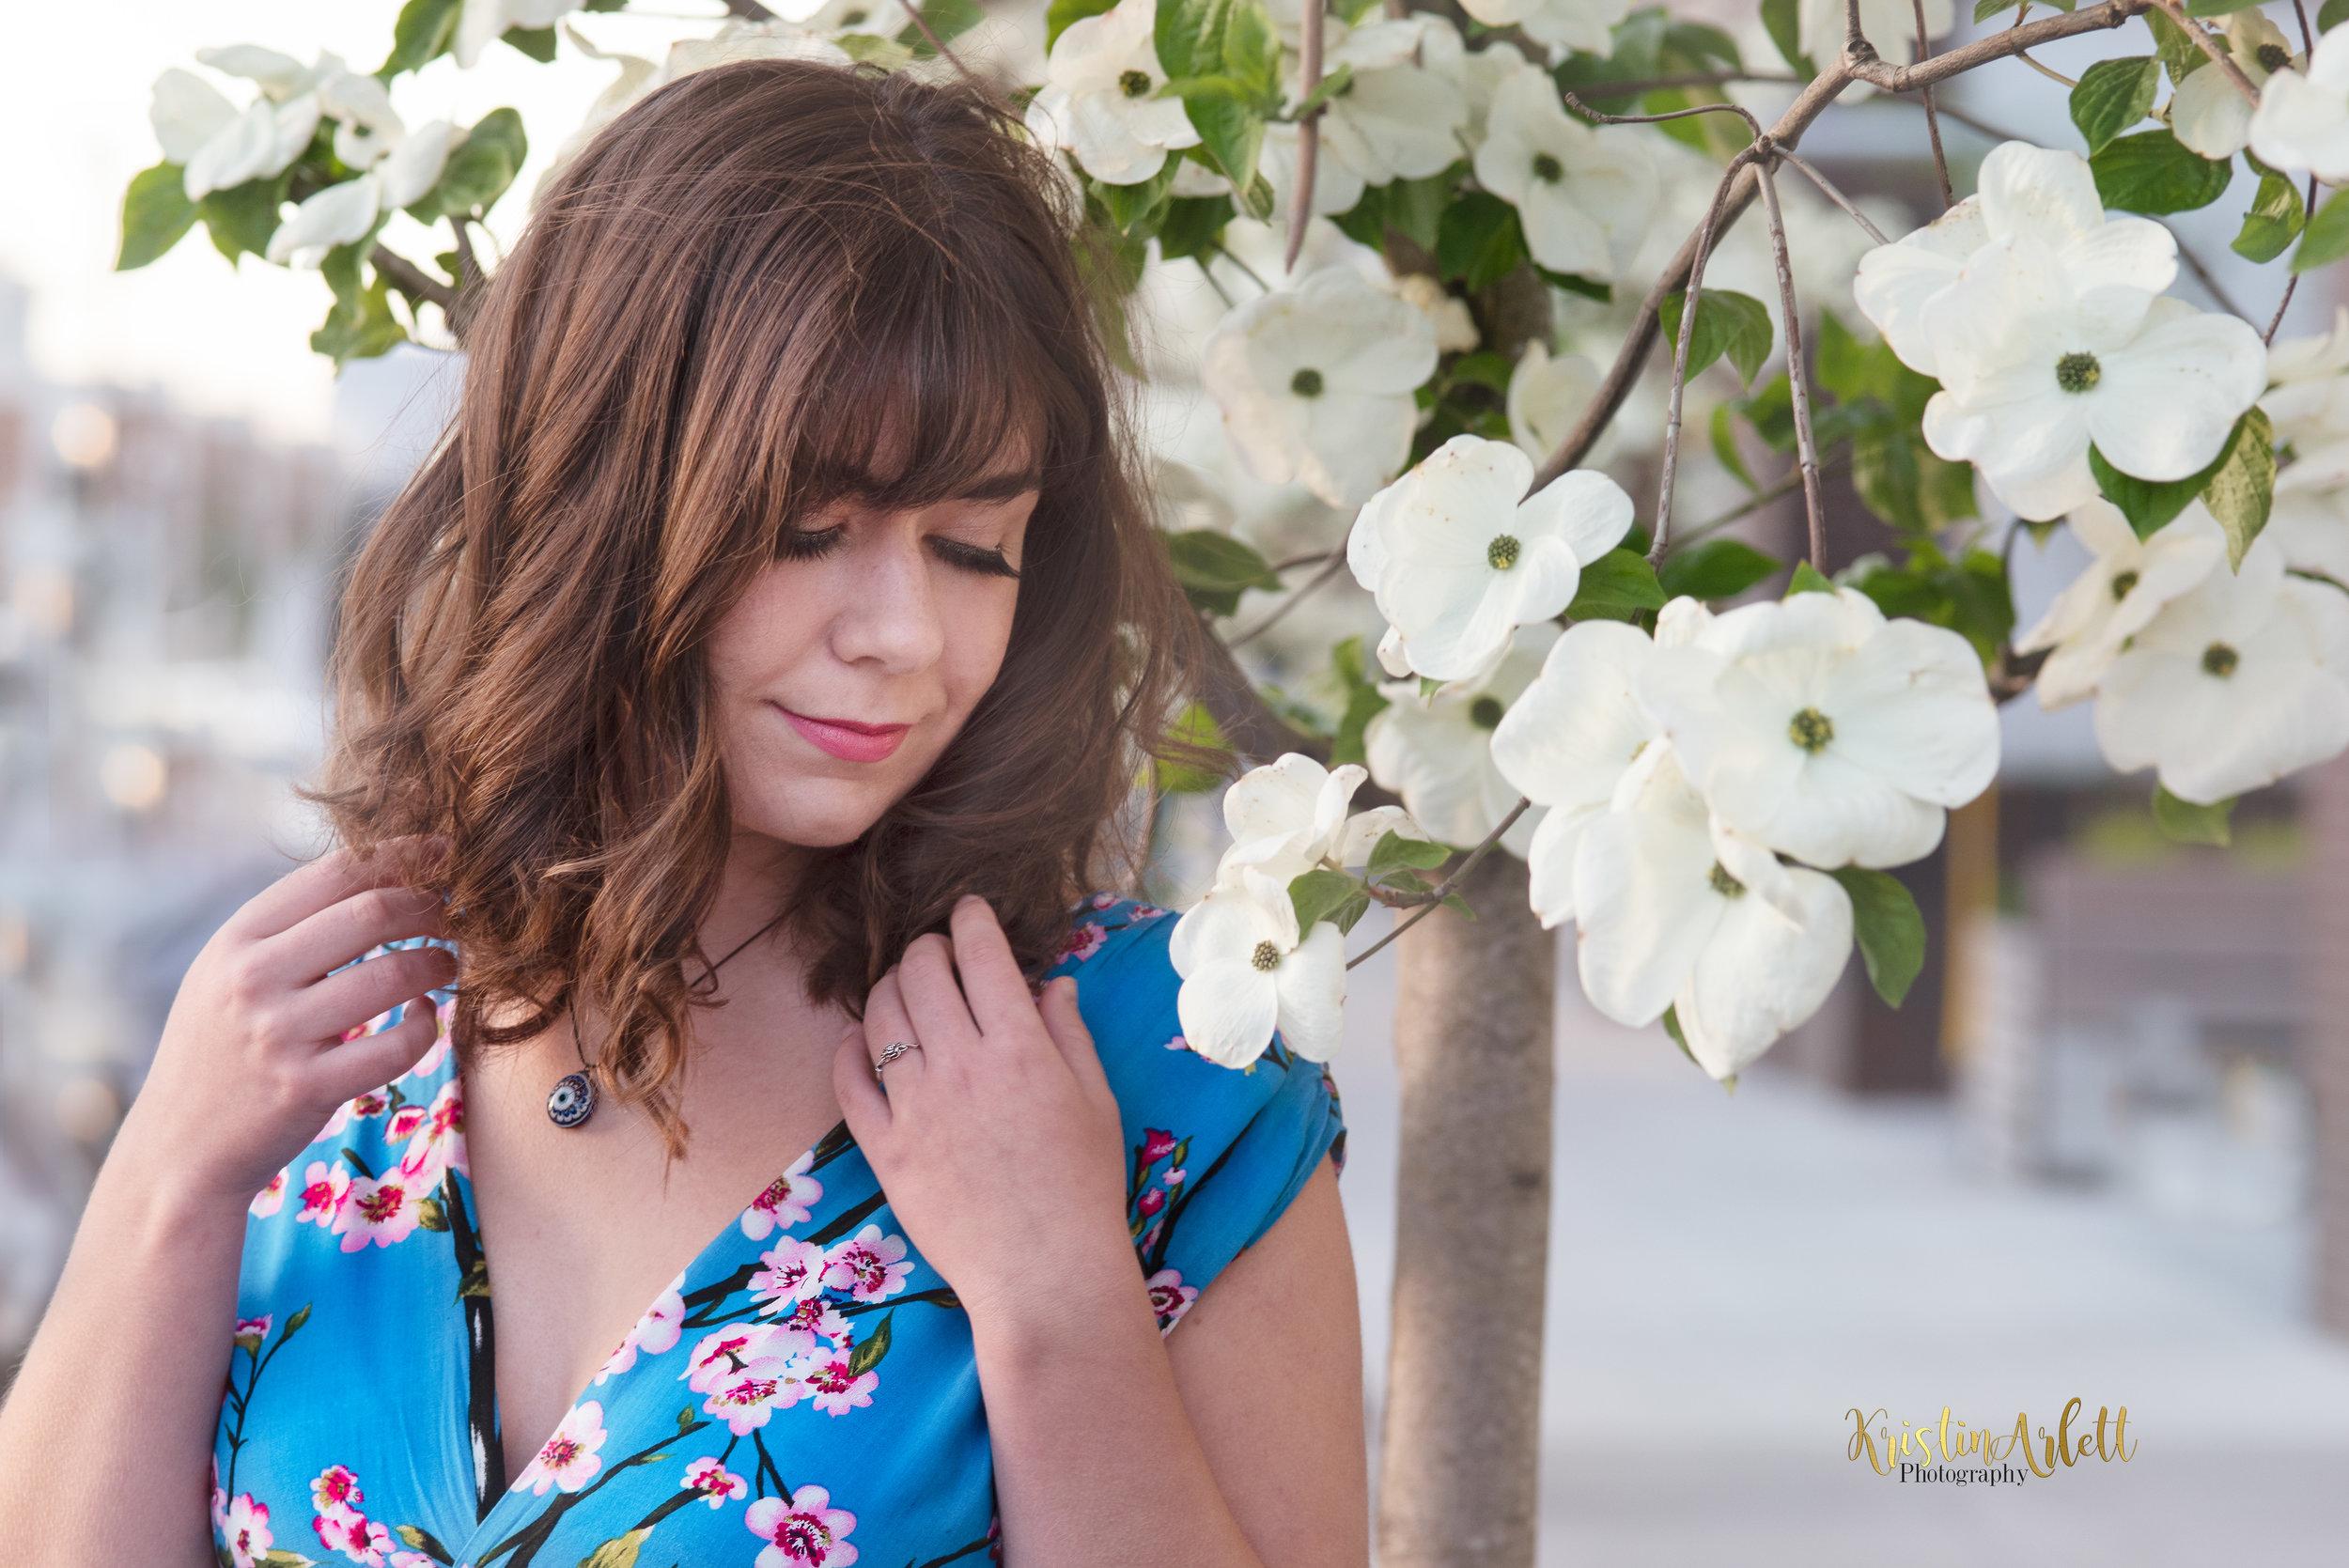 Amy Cherry blossom 1.jpg